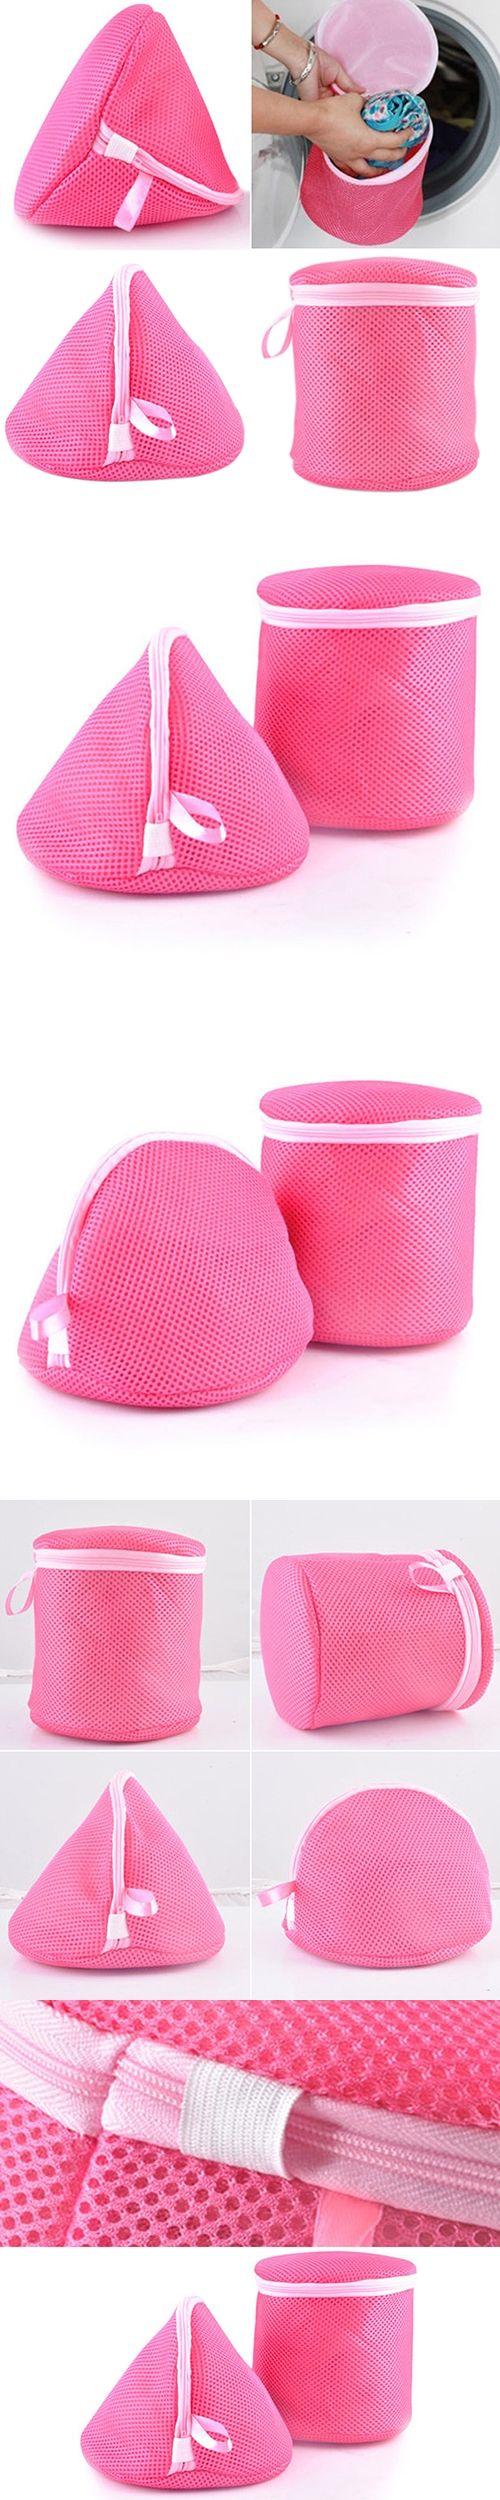 Underwear Aid Bra Laundry Mesh Wash Basket Net Washing Storage Zipper Bag 6QFI